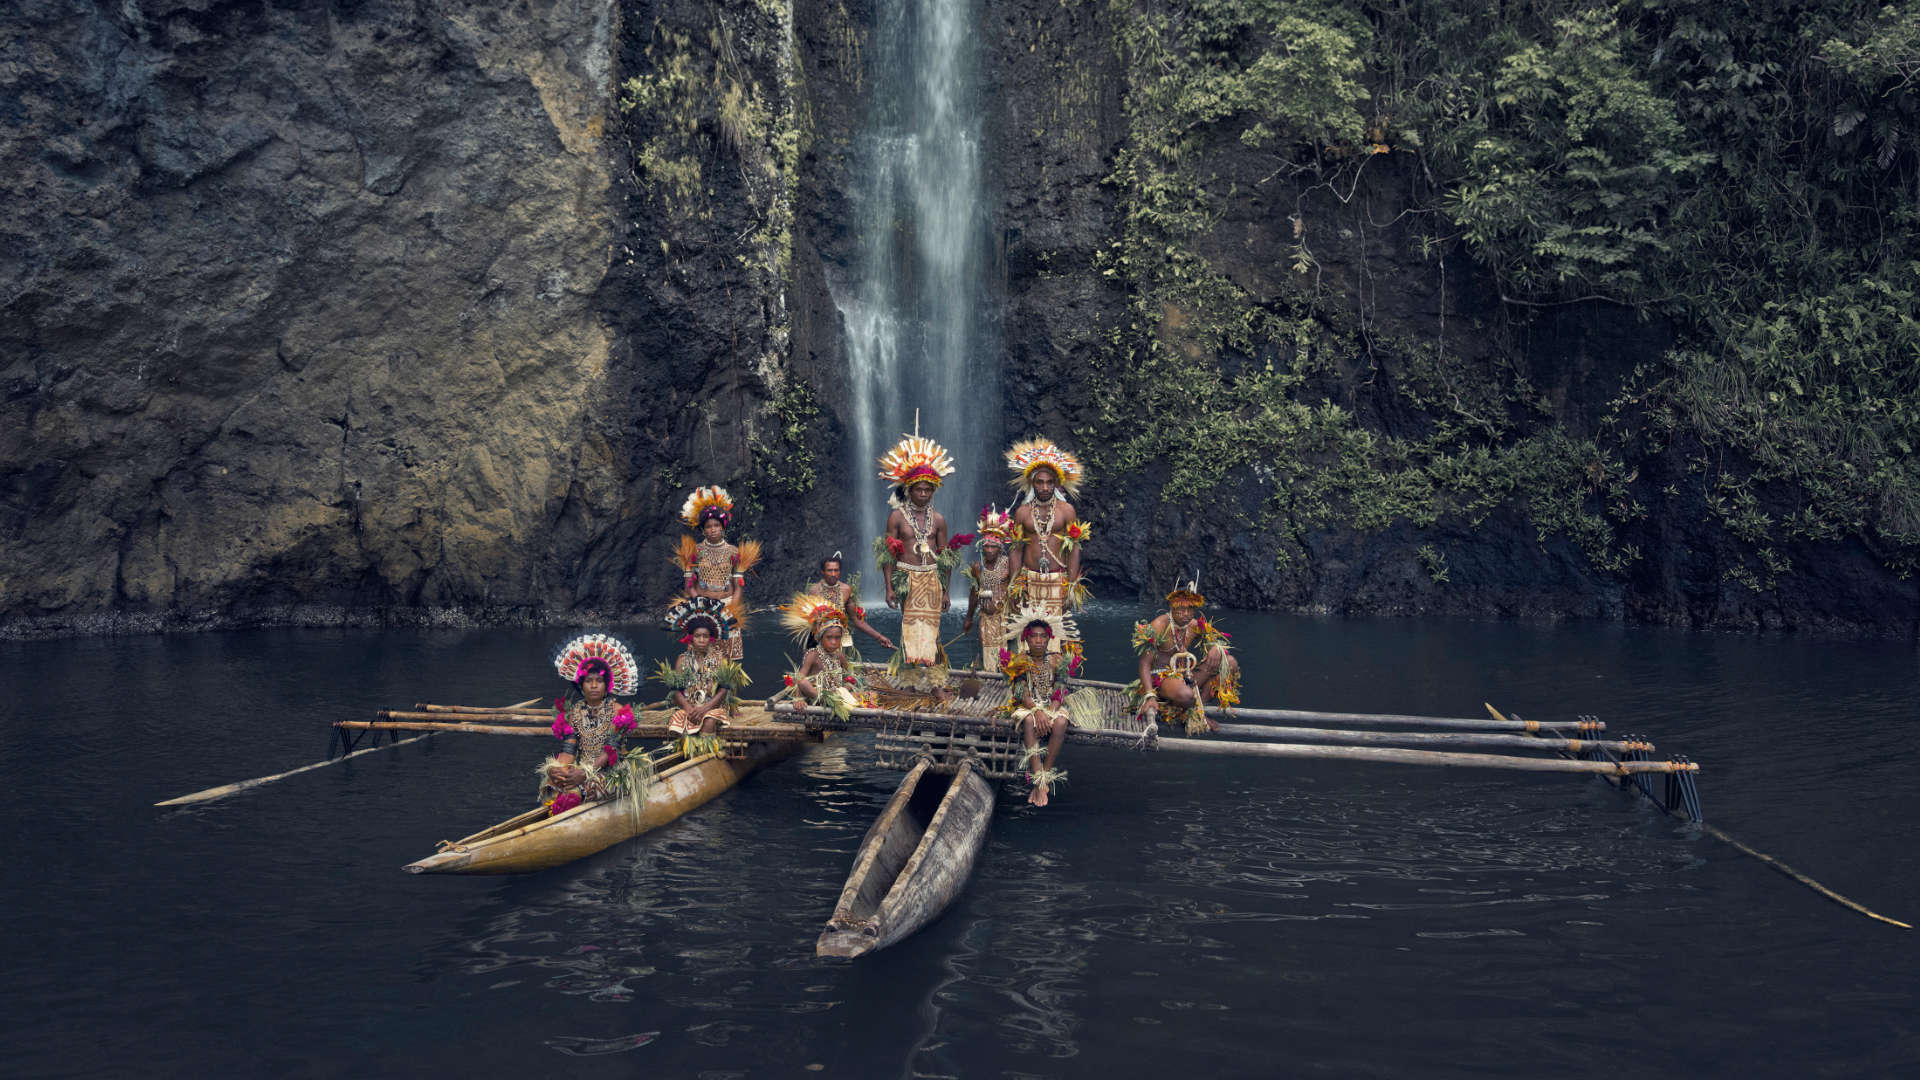 Uramana stam, Tufi, Papua New Guinea